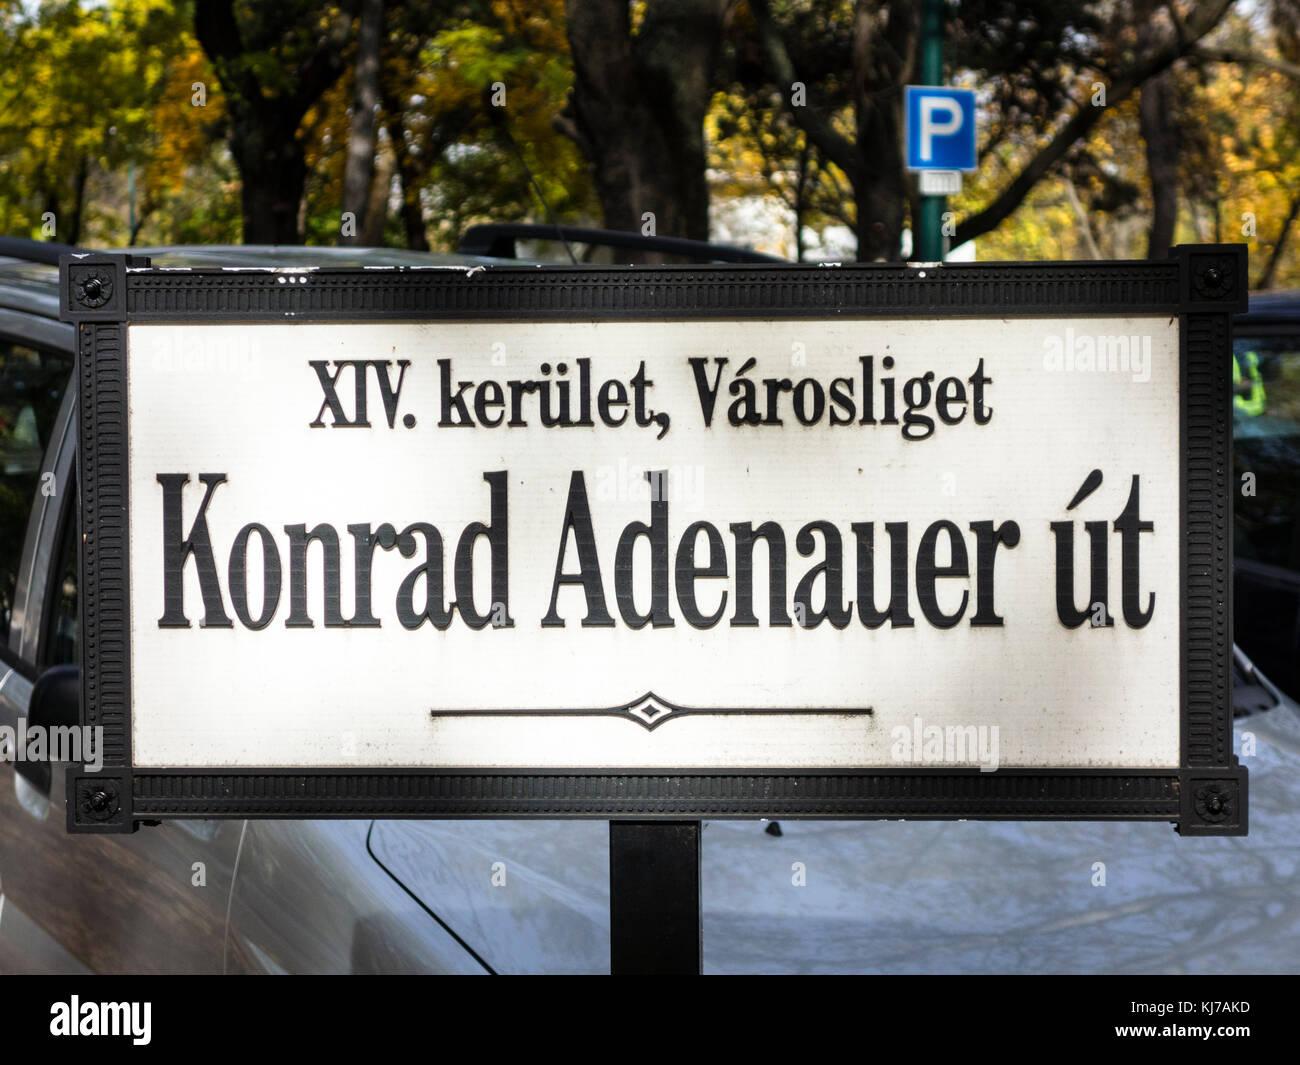 Adenauer Street in Budapest, Hungary - Stock Image